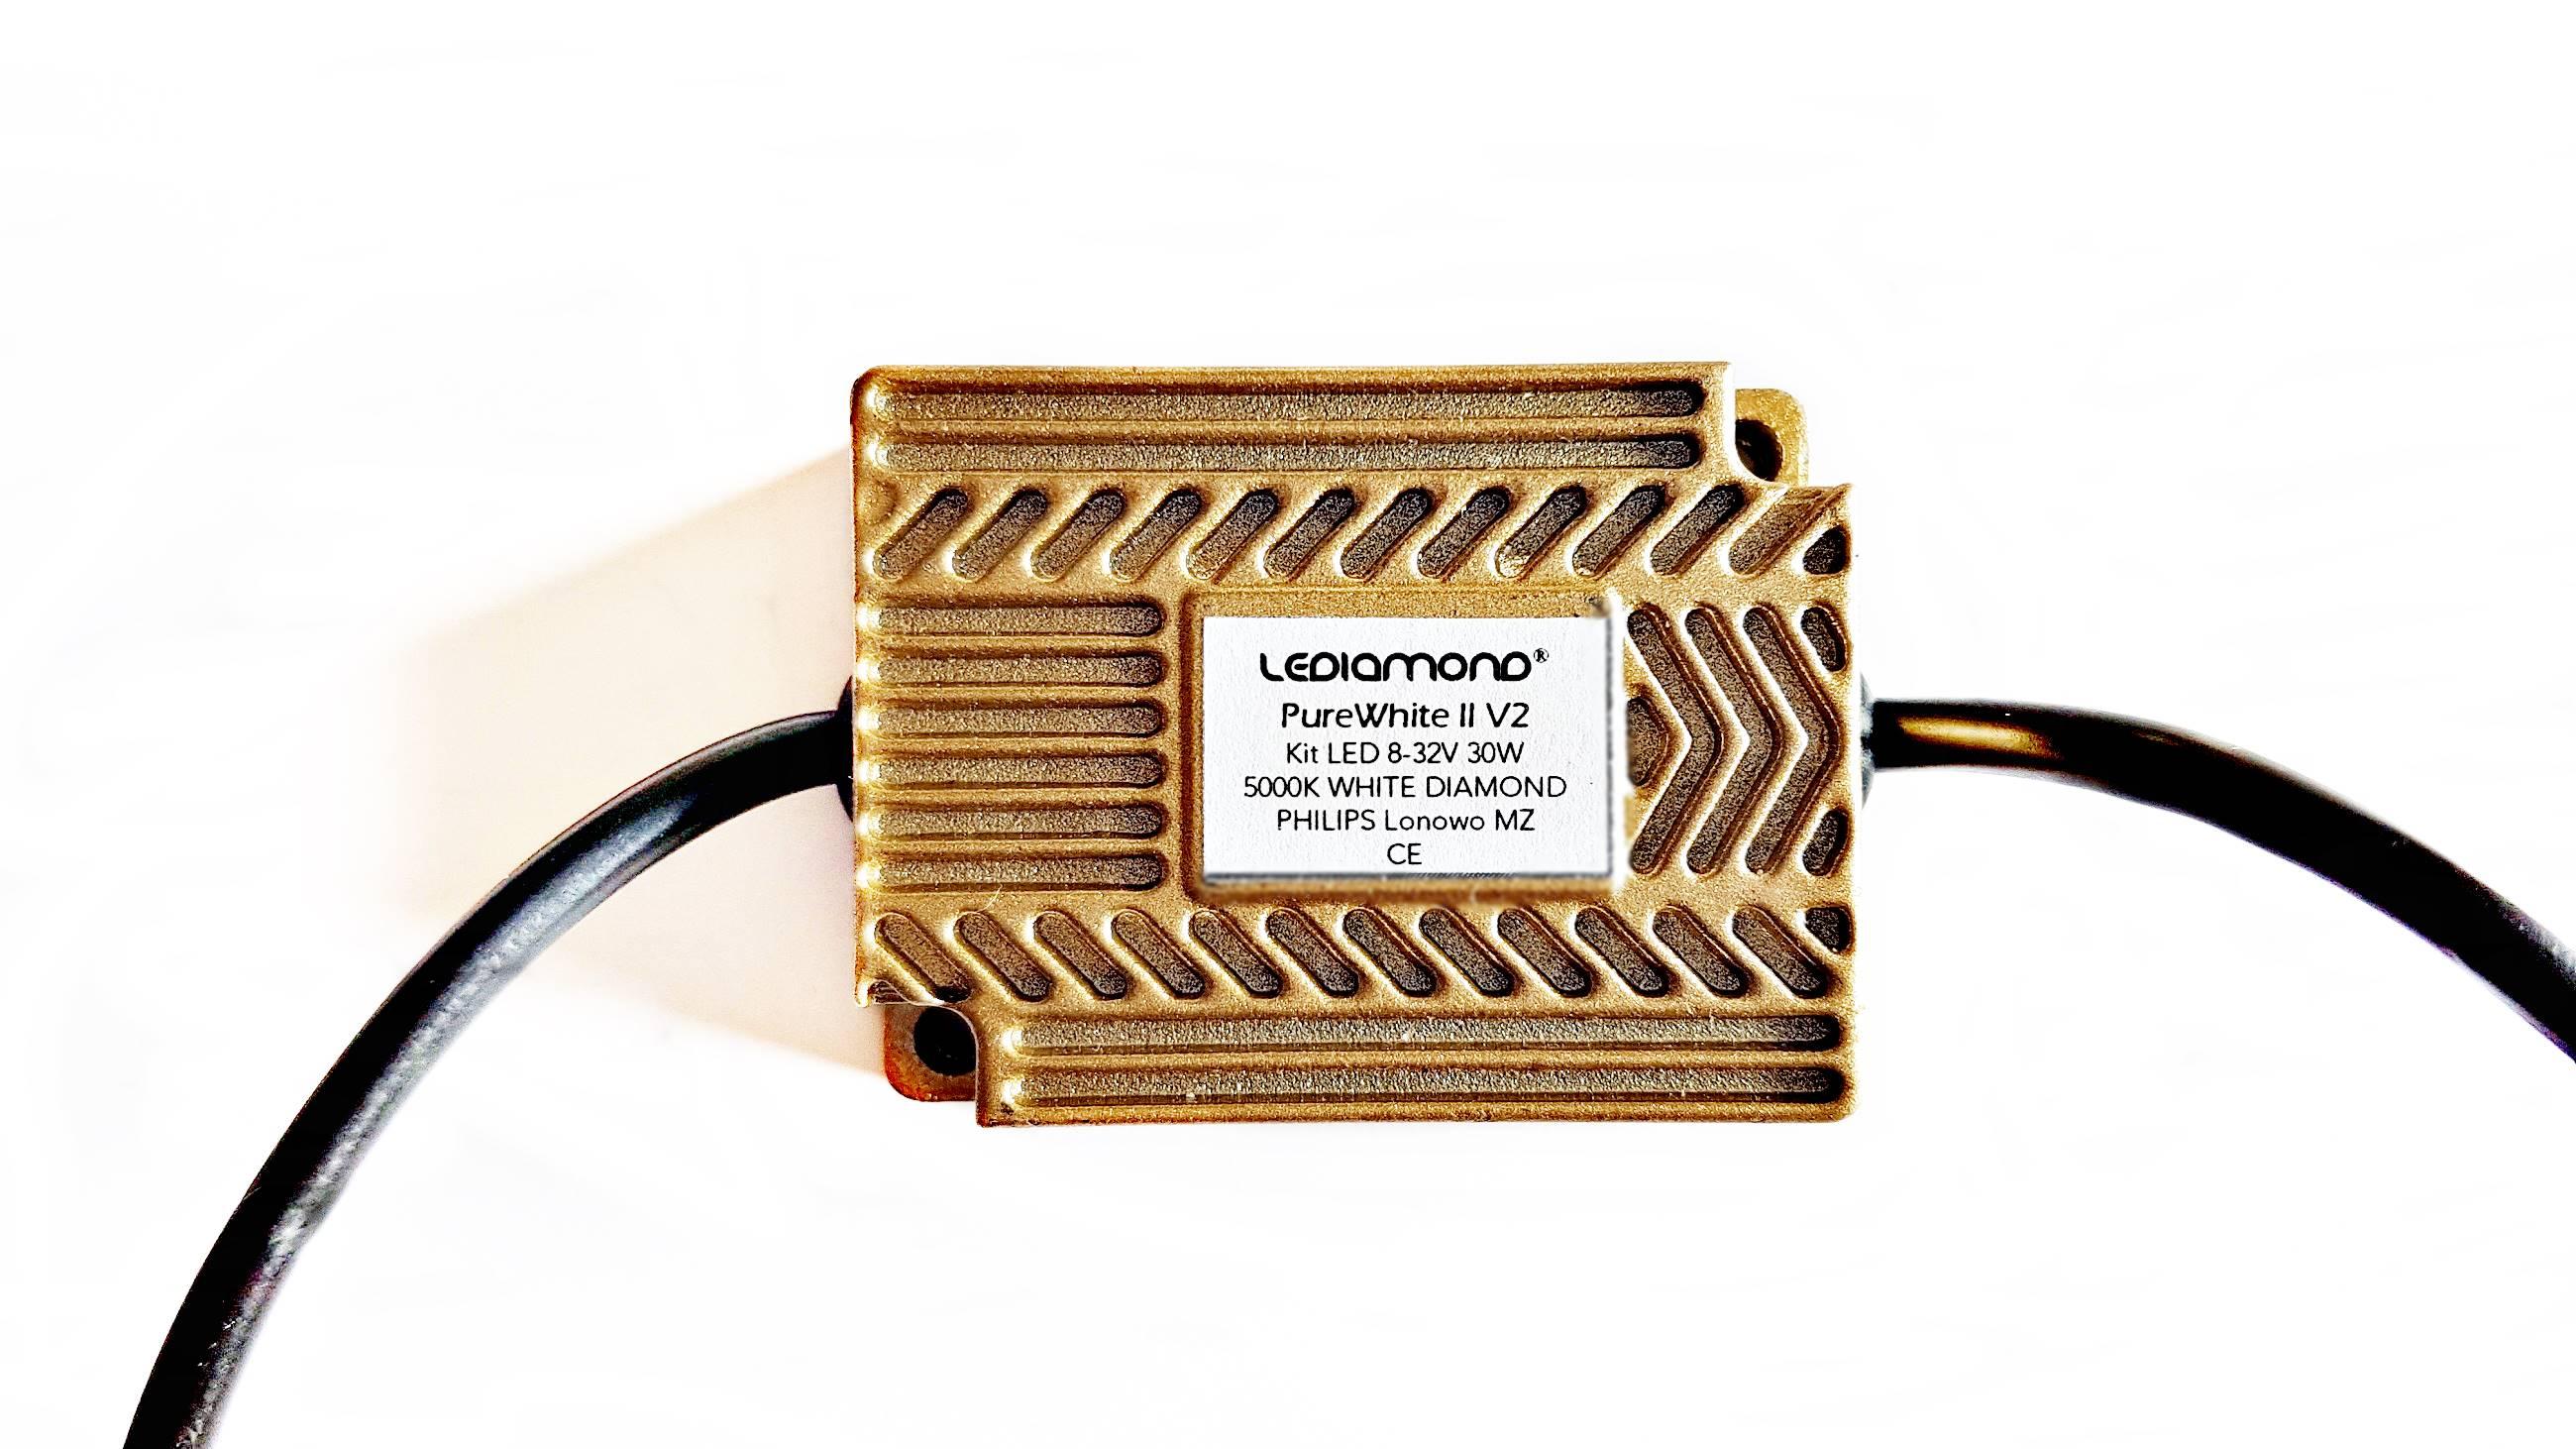 LEDIAMOND PUREWHITE II GOLD V2 transformador